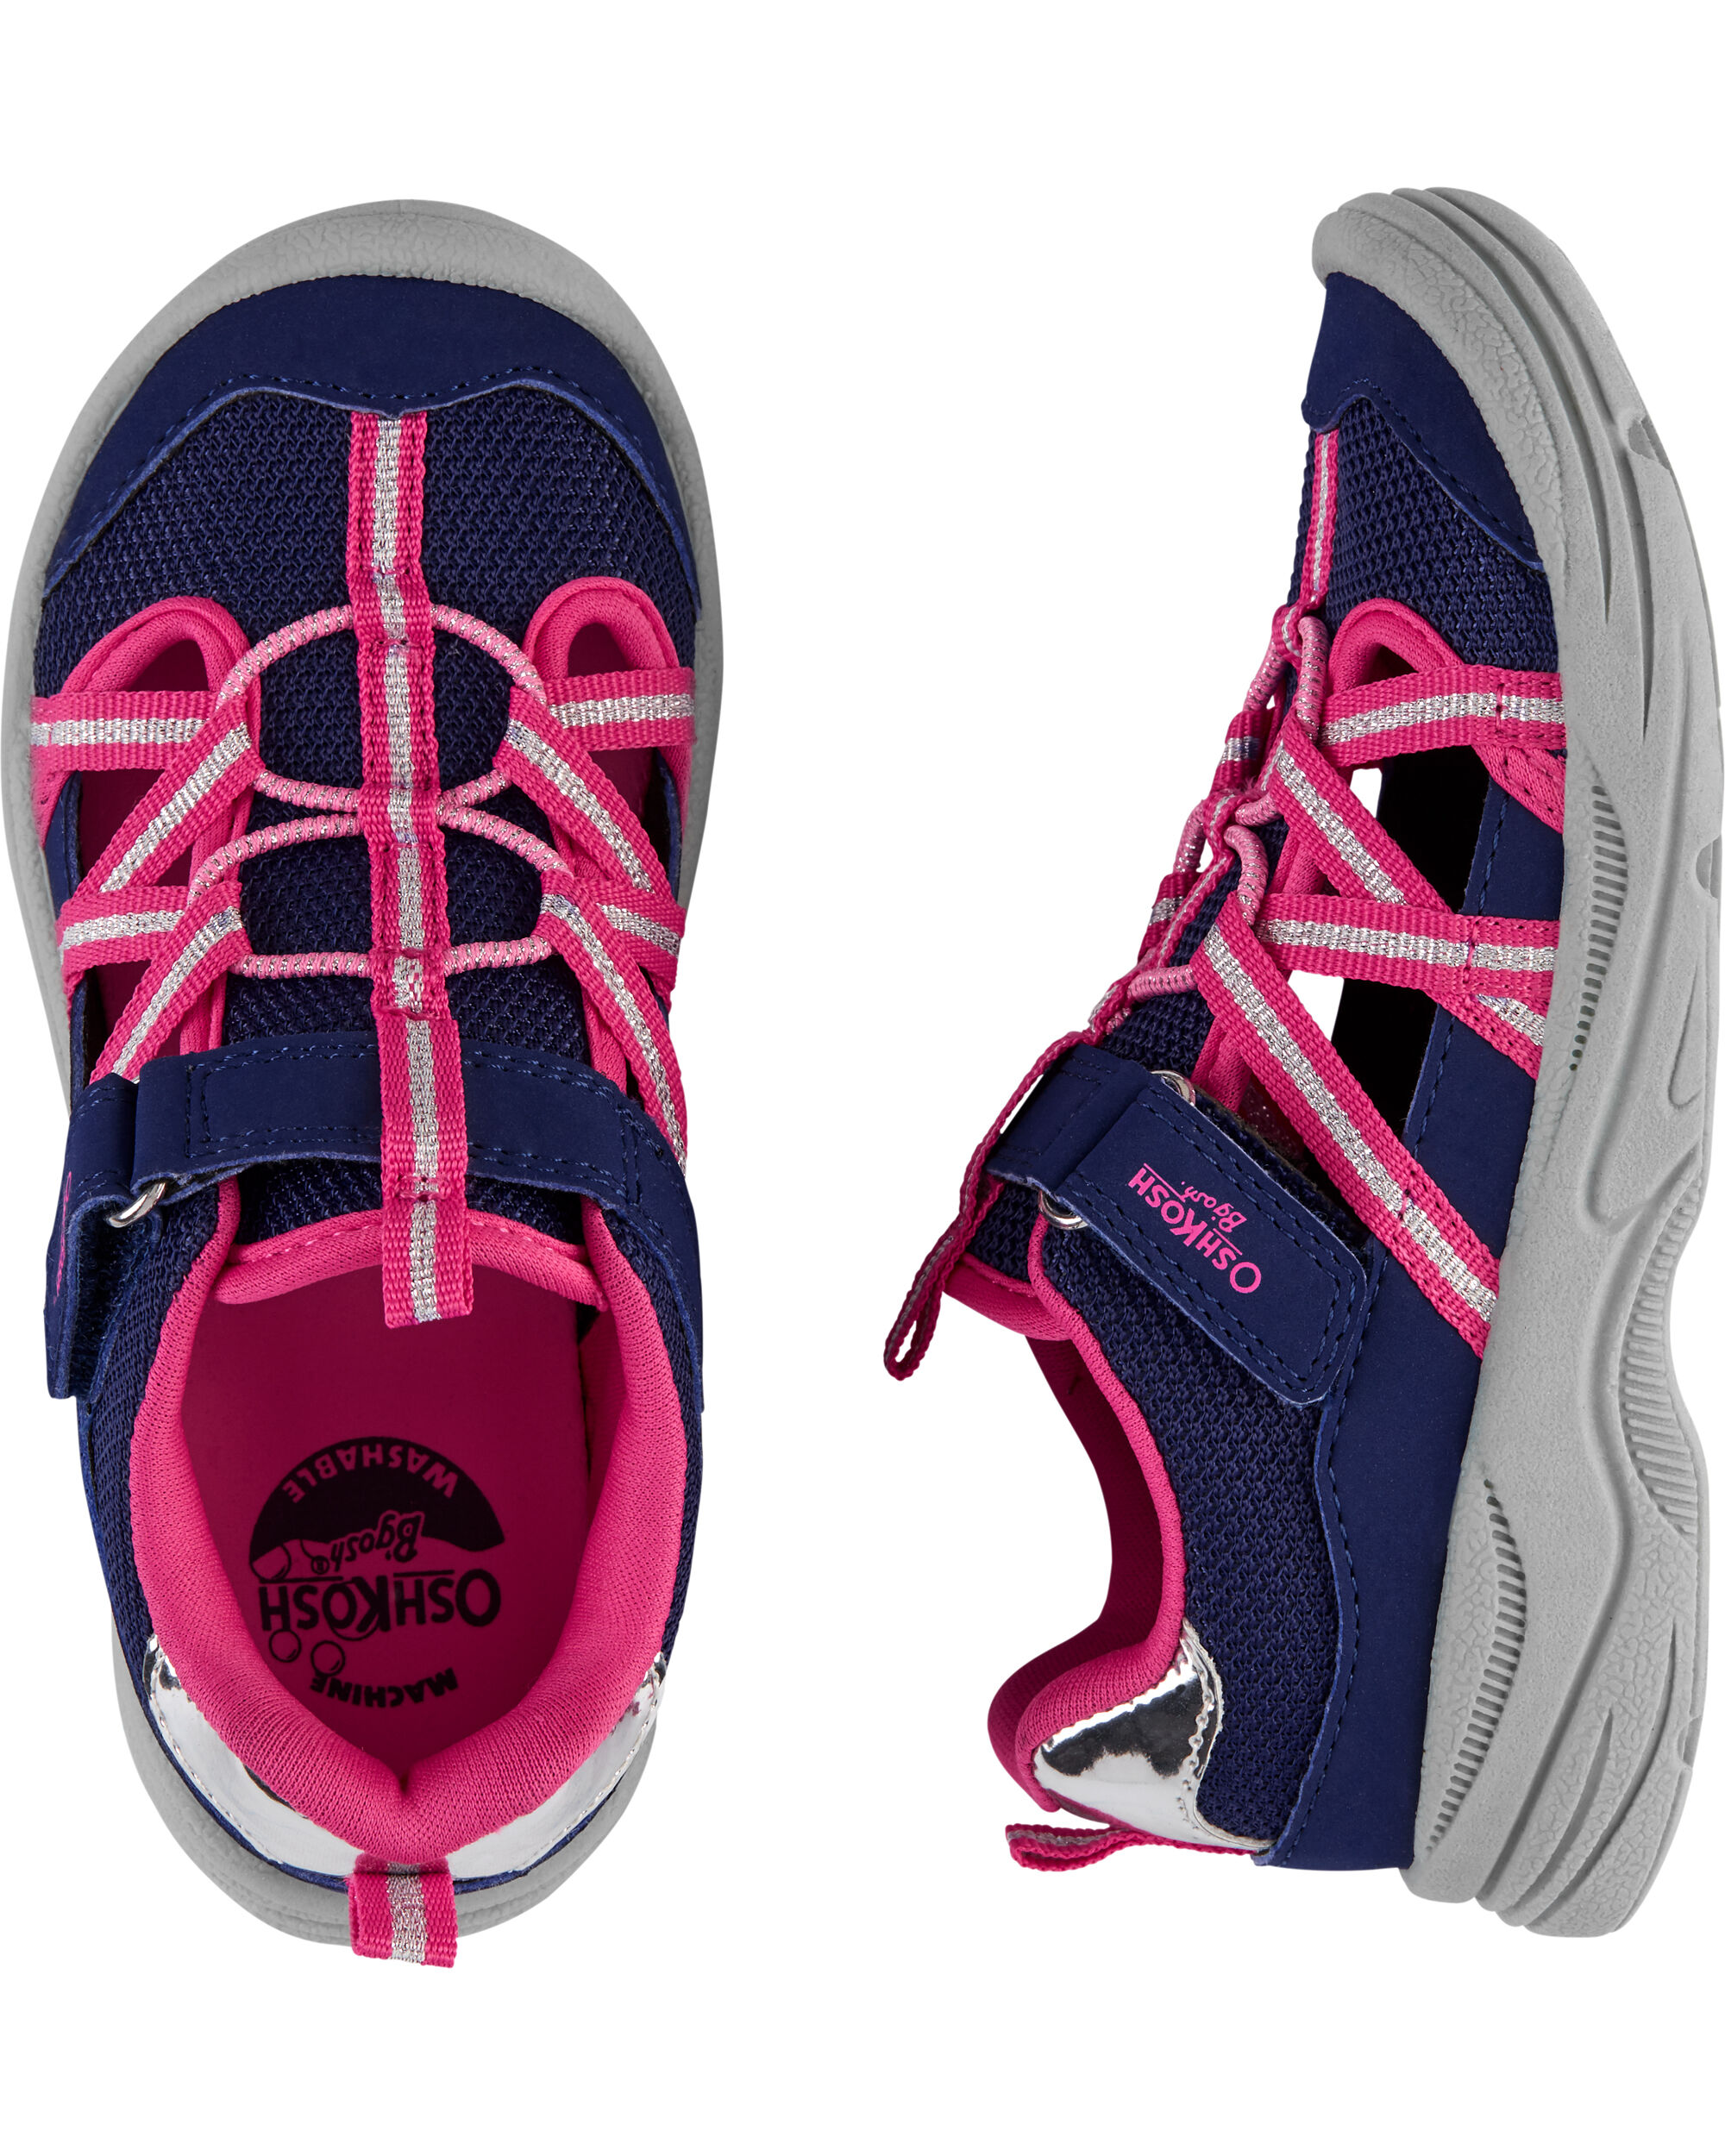 OshKosh Navy Bump Toe Sandals | oshkosh.com